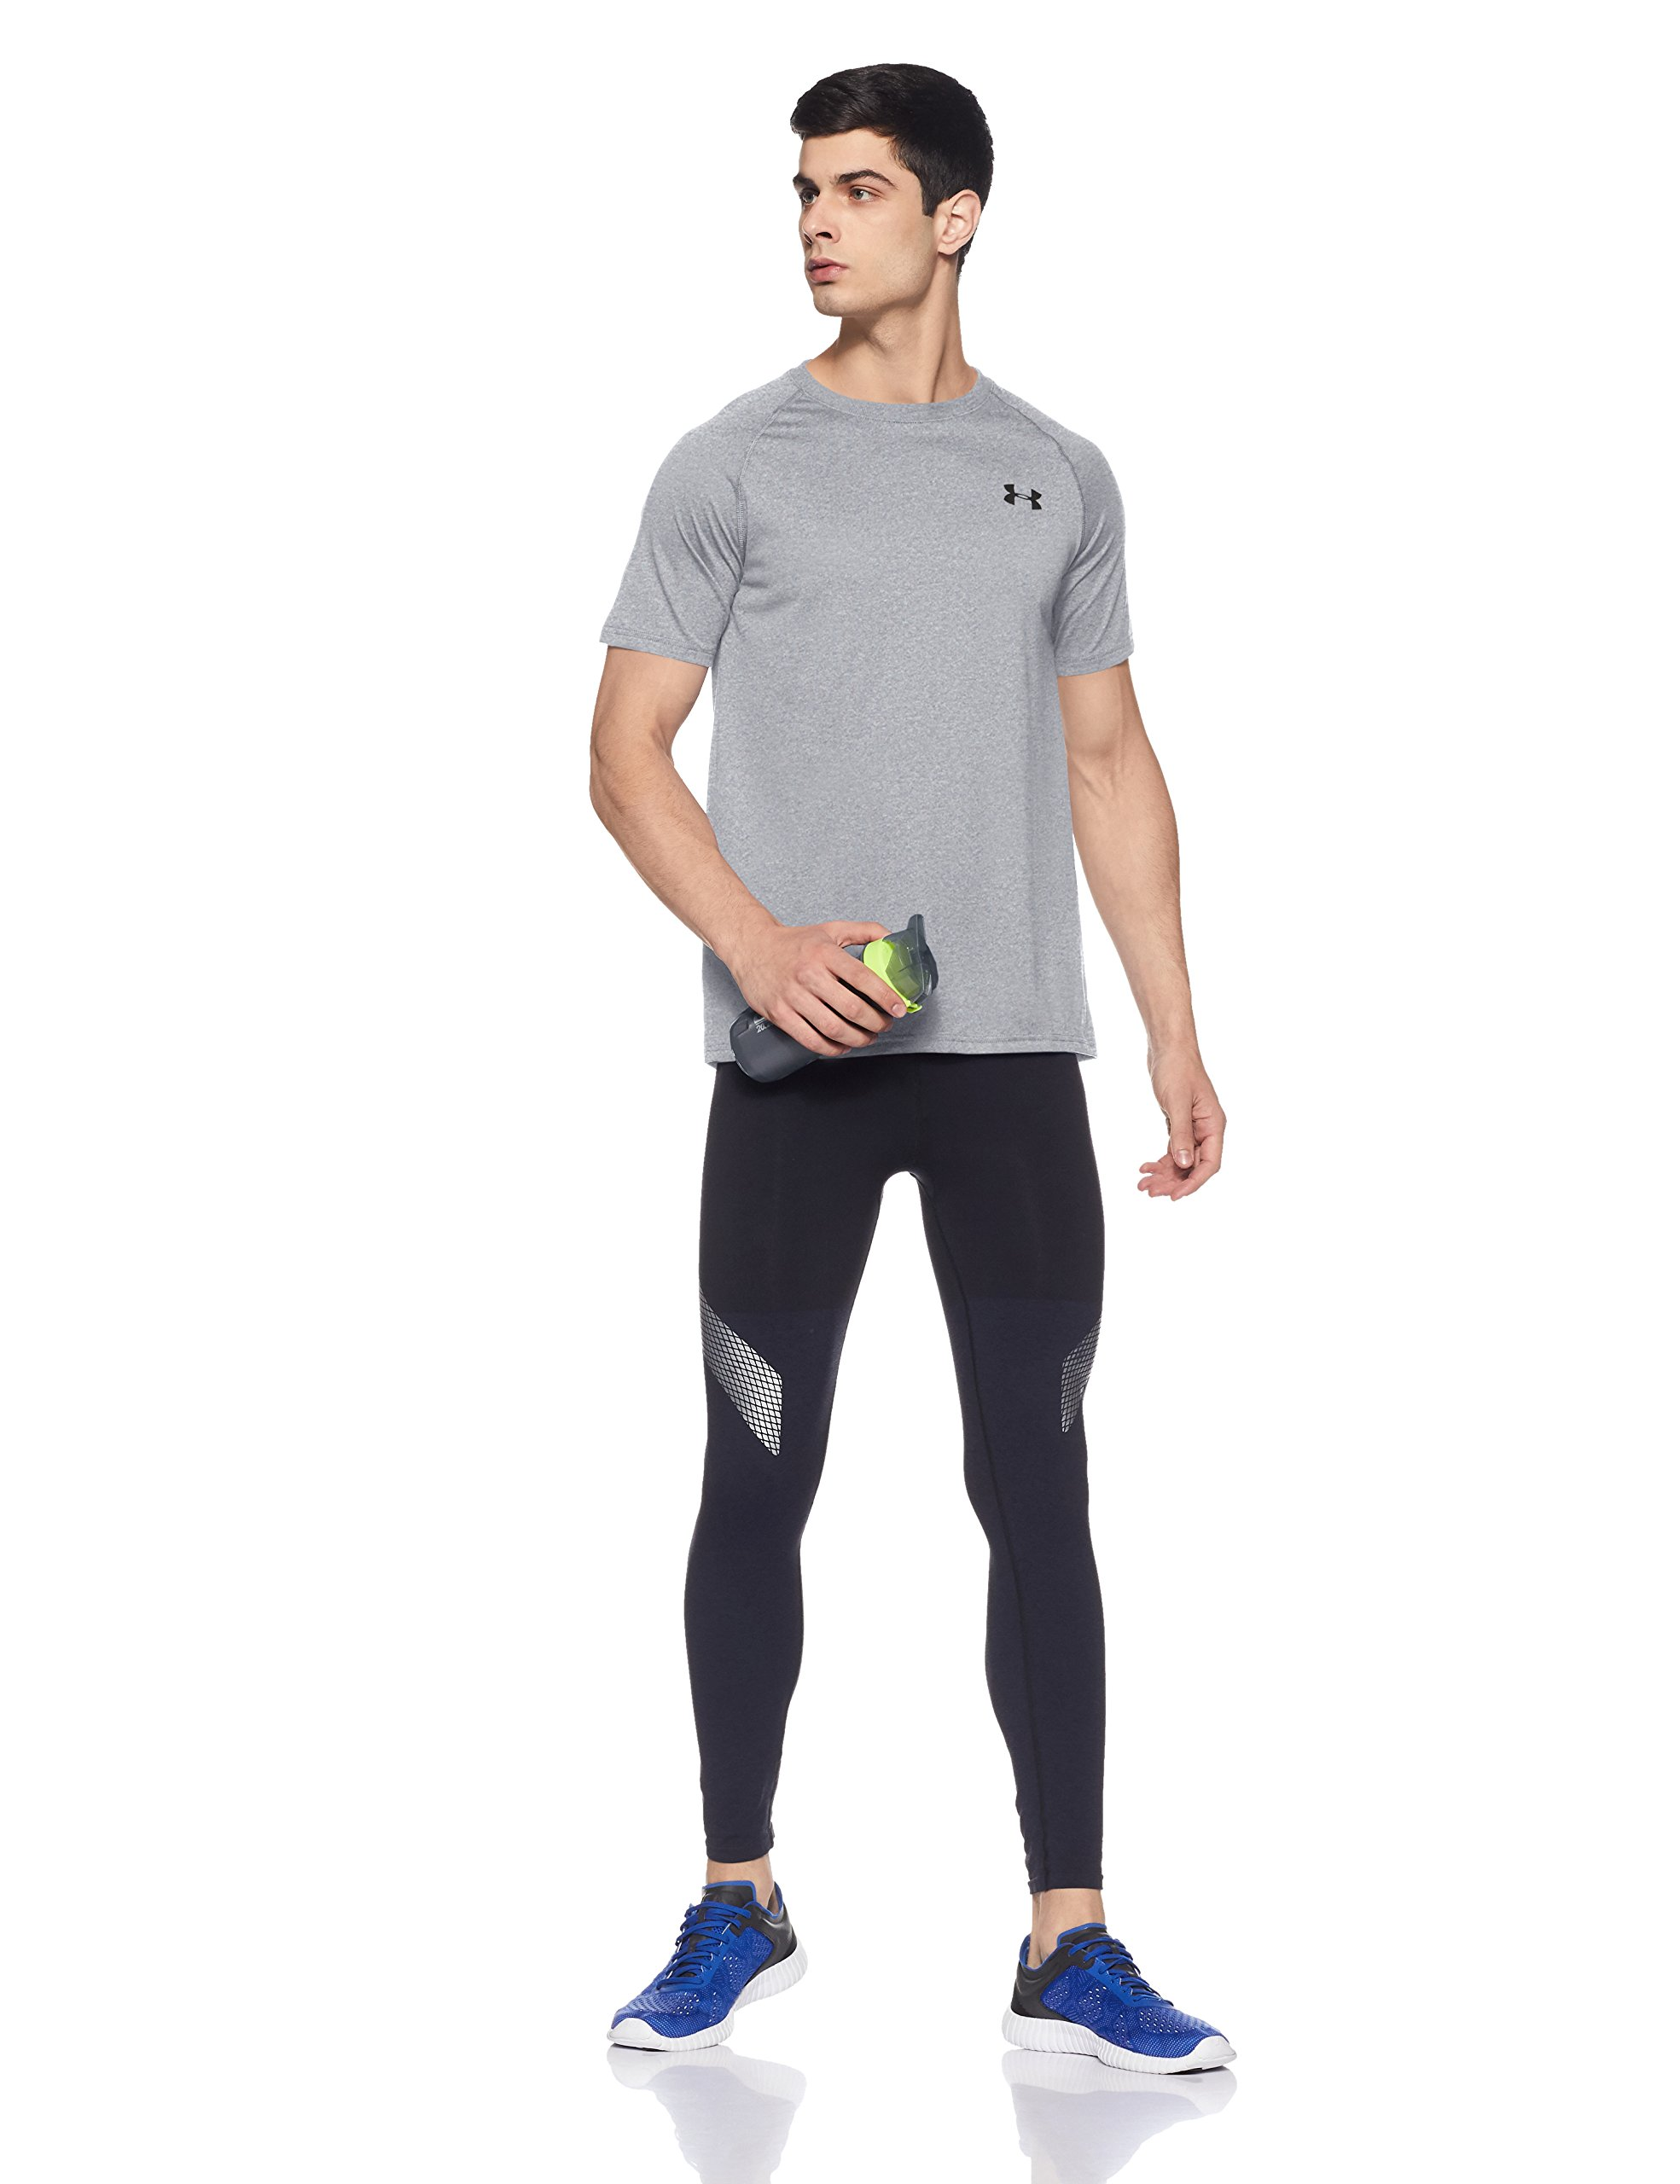 Under Armour Men's Tech Short Sleeve T-Shirt, True Gray Heather /Black, XXXXX-Large by Under Armour (Image #8)